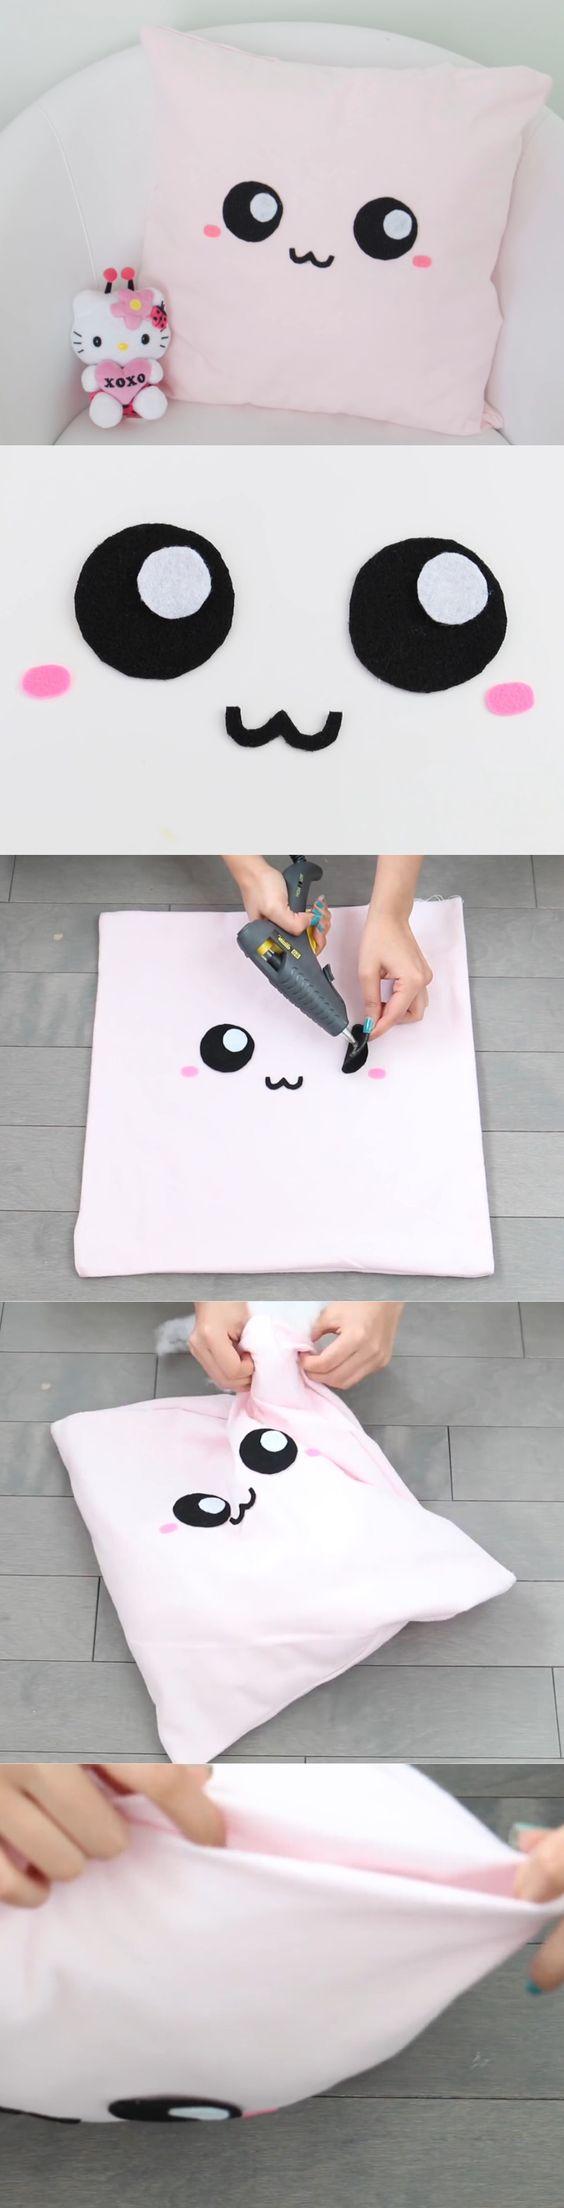 Nim C's cute face pillowcase DIY tutorial part 2. So cute!!!!: